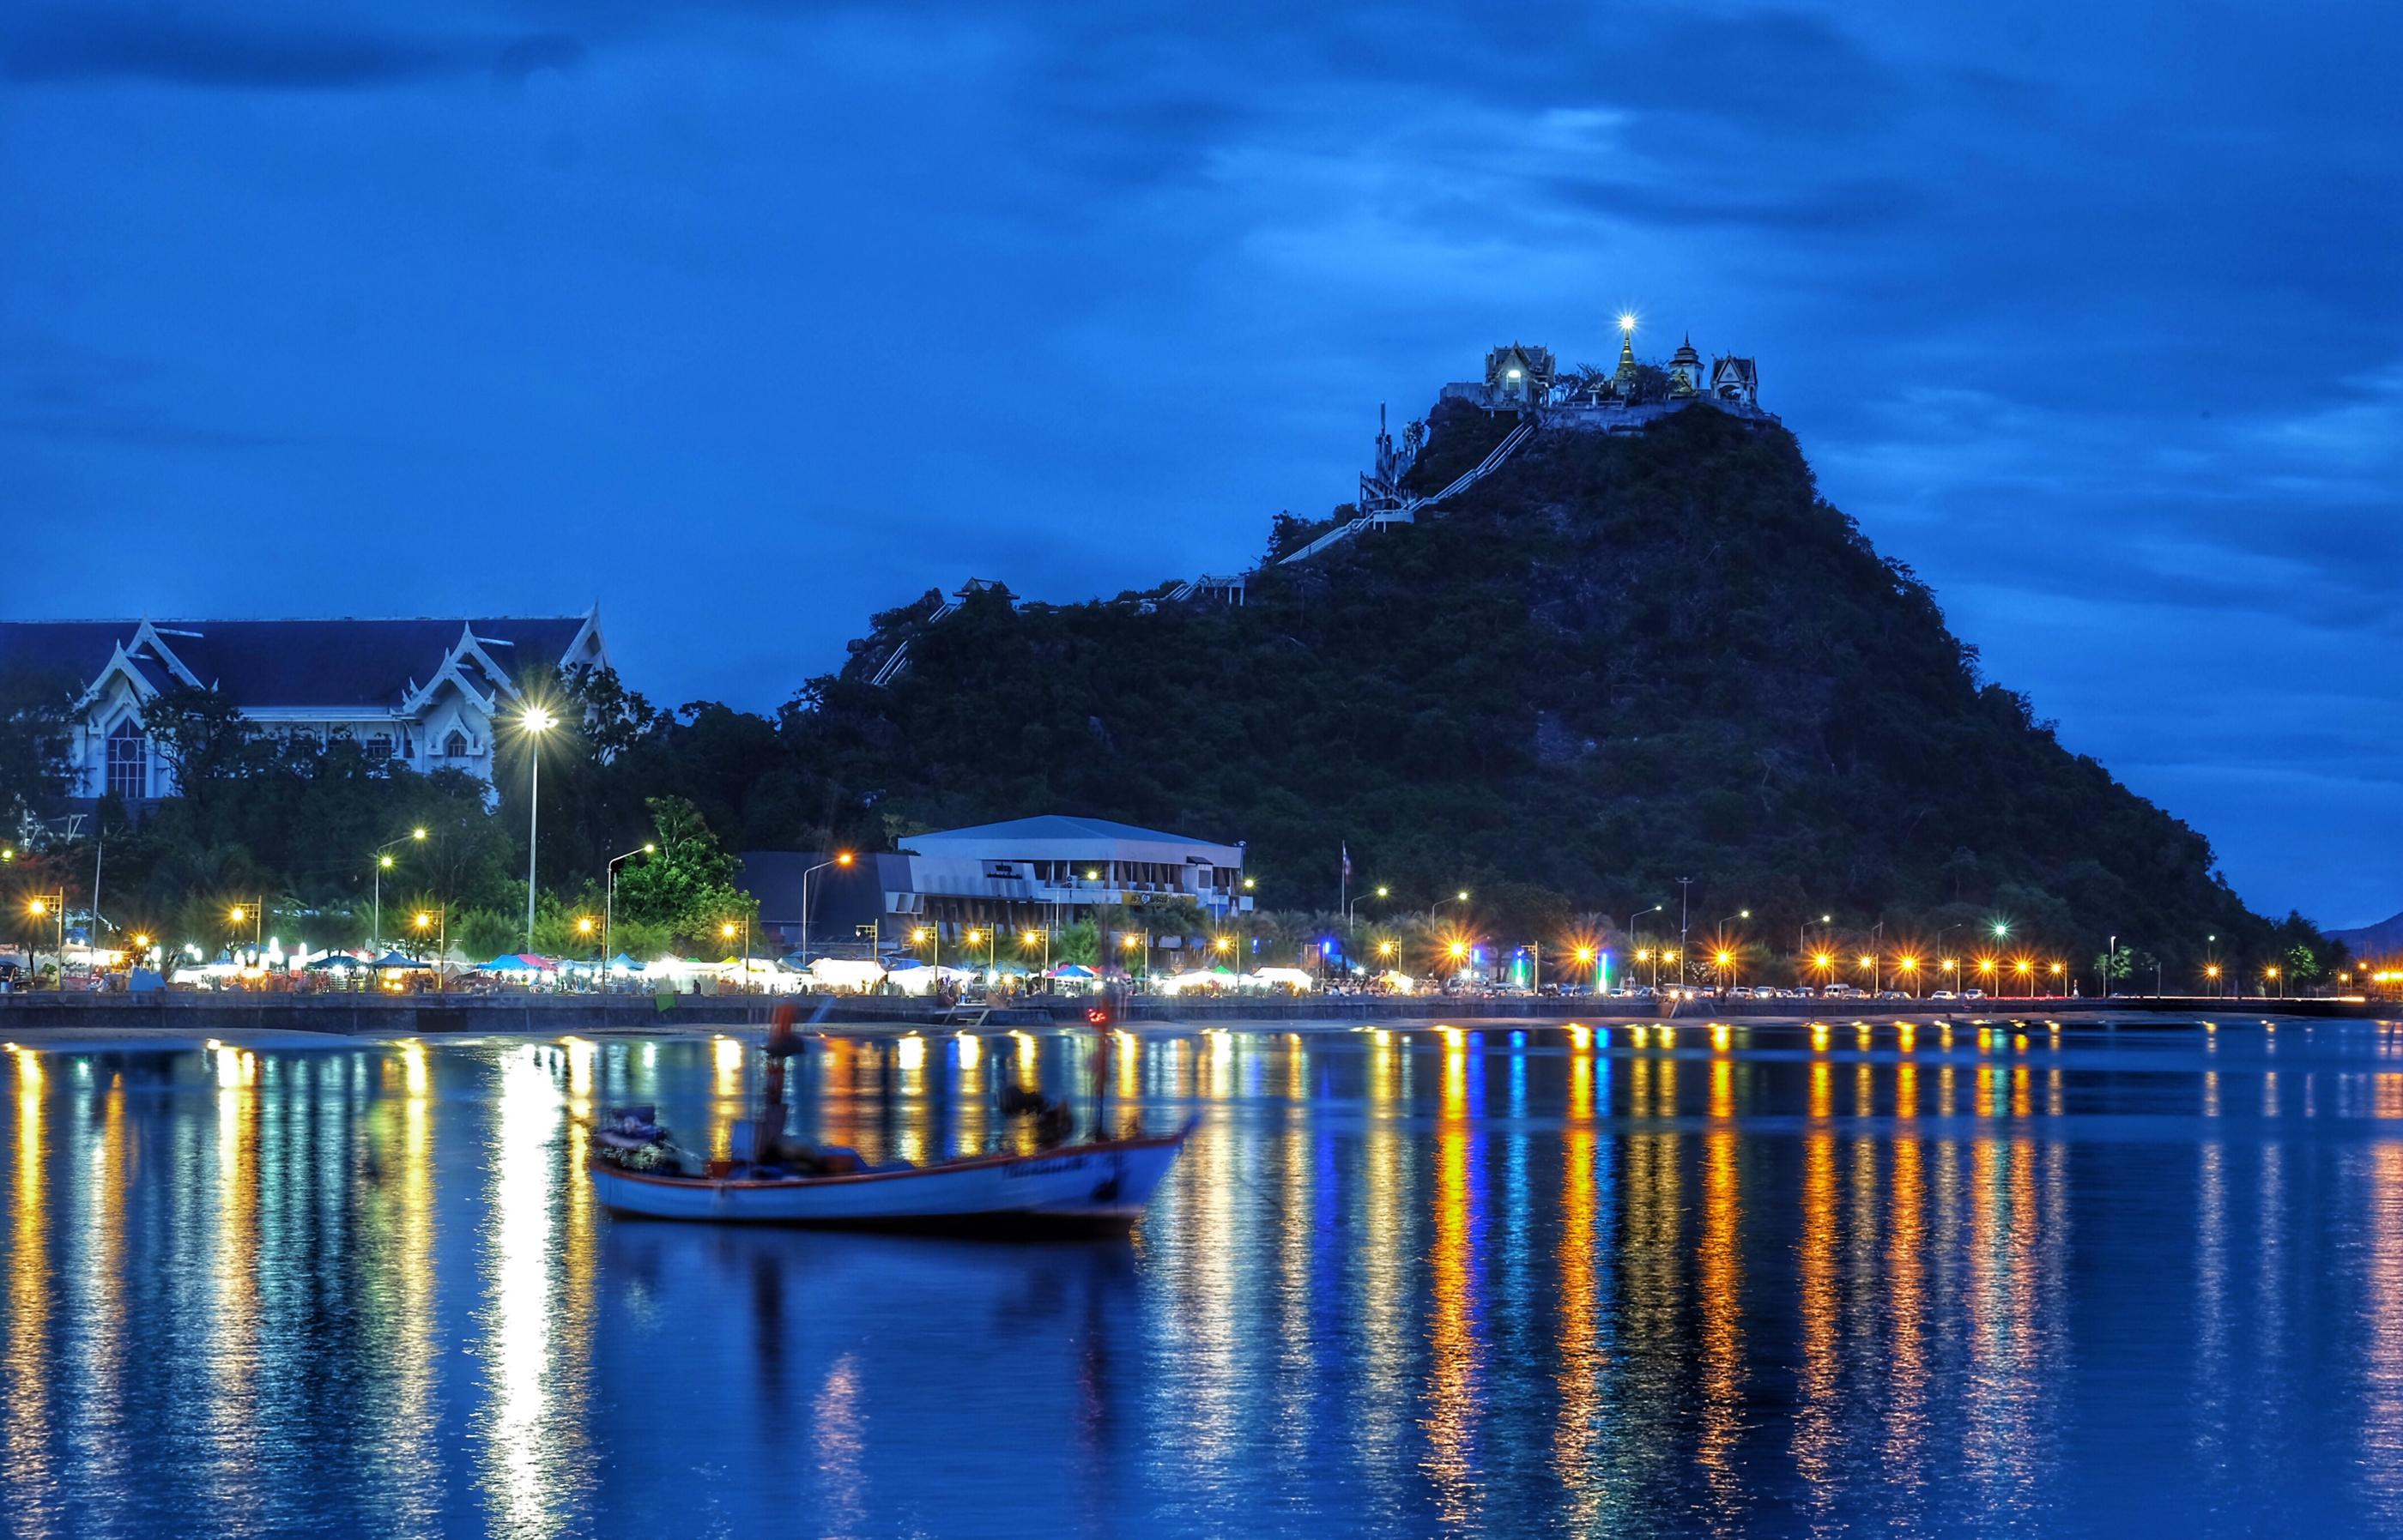 、タイ王国、住宅、夕、街灯、建物、都市